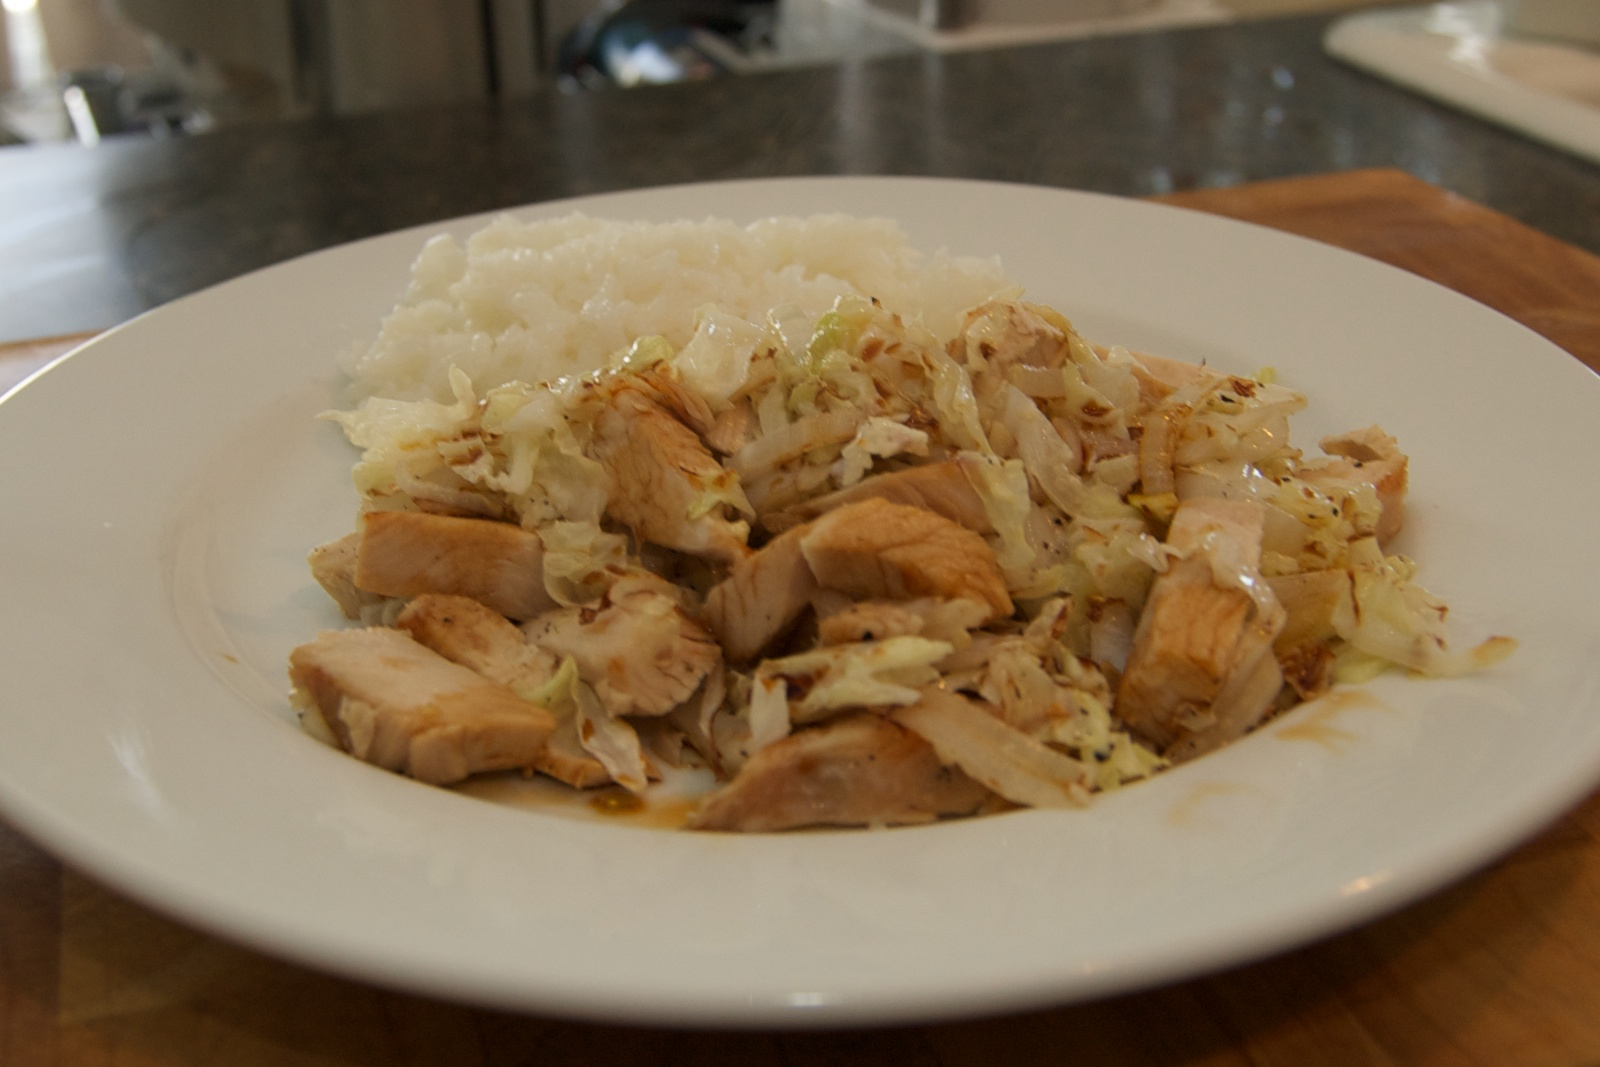 http://blog.rickk.com/food/2010/12/31/ate.20101231.l.jpg